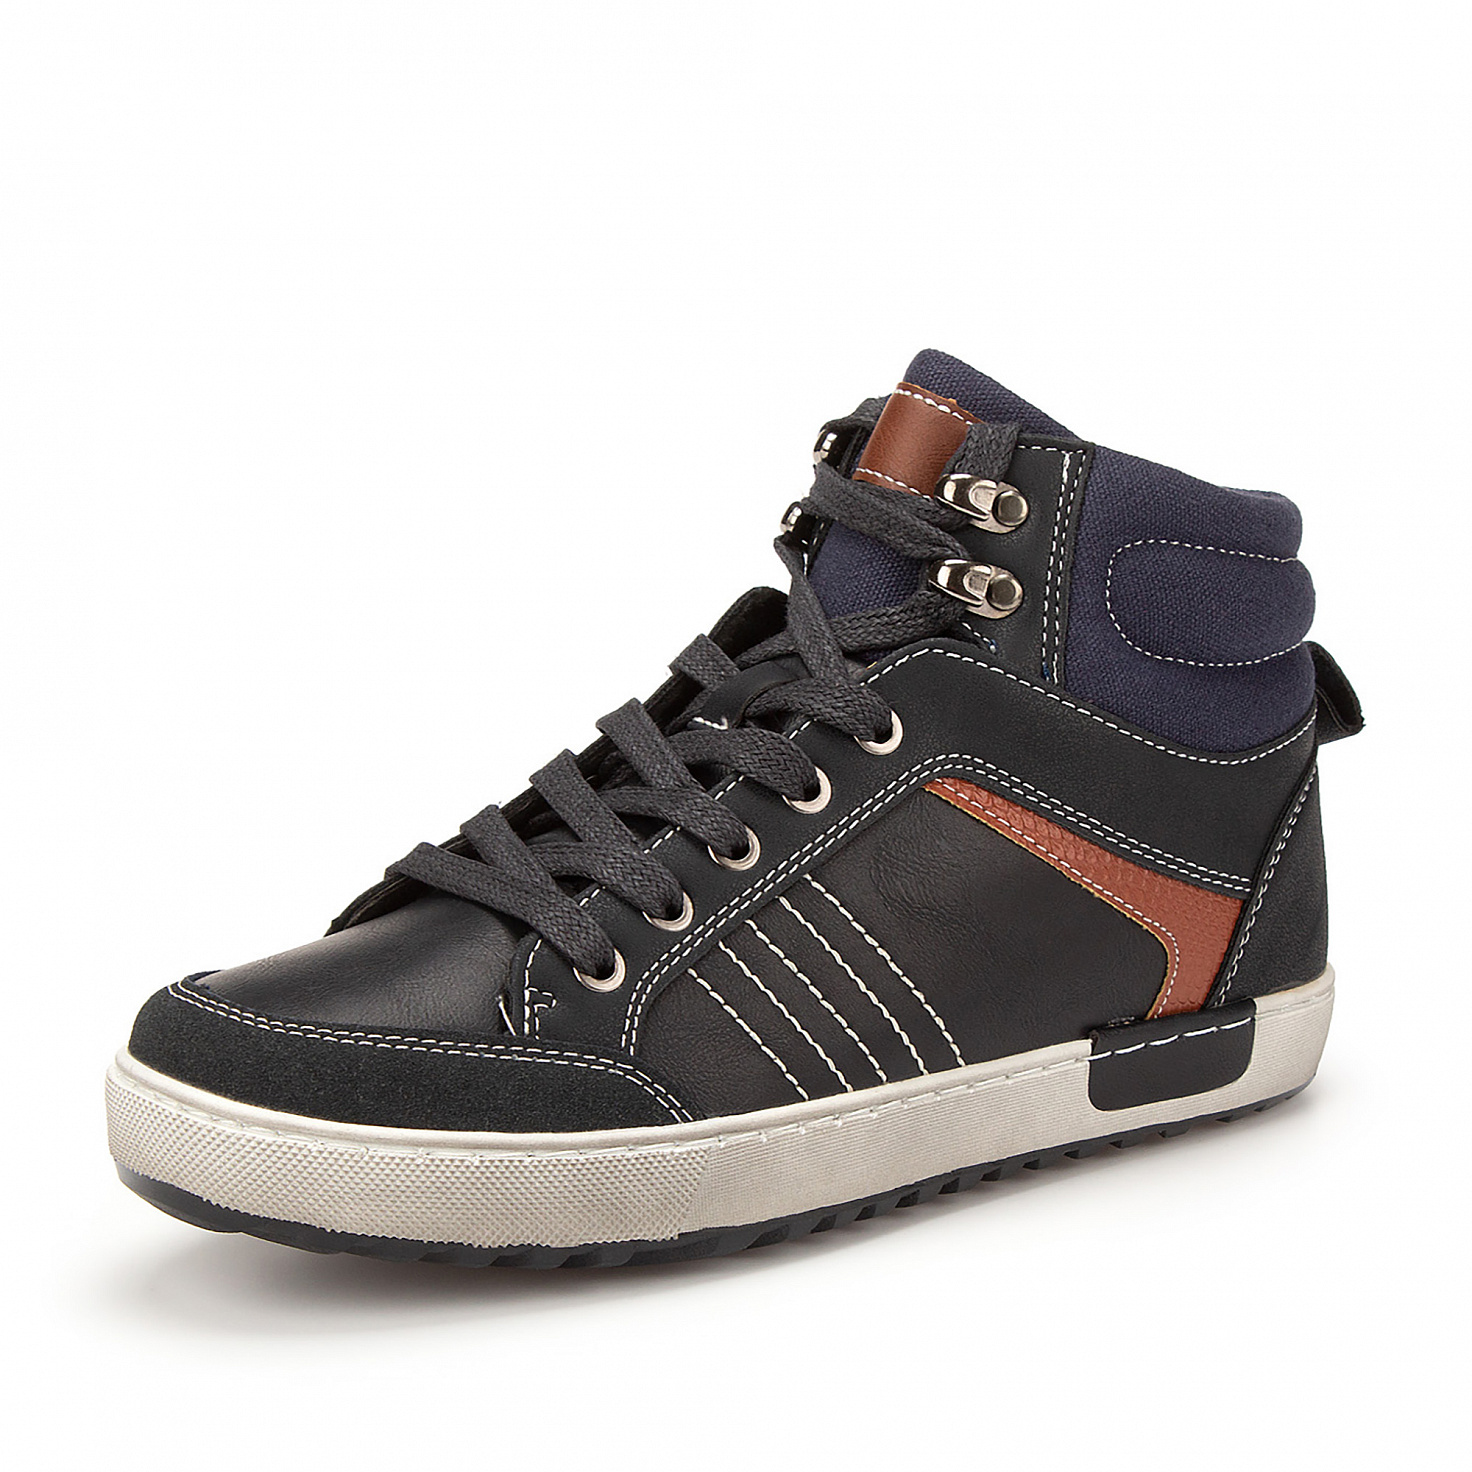 Купить 189-02BO-032SR, Ботинки для мальчиков ZENDEN, цв. синий, р-р 39,